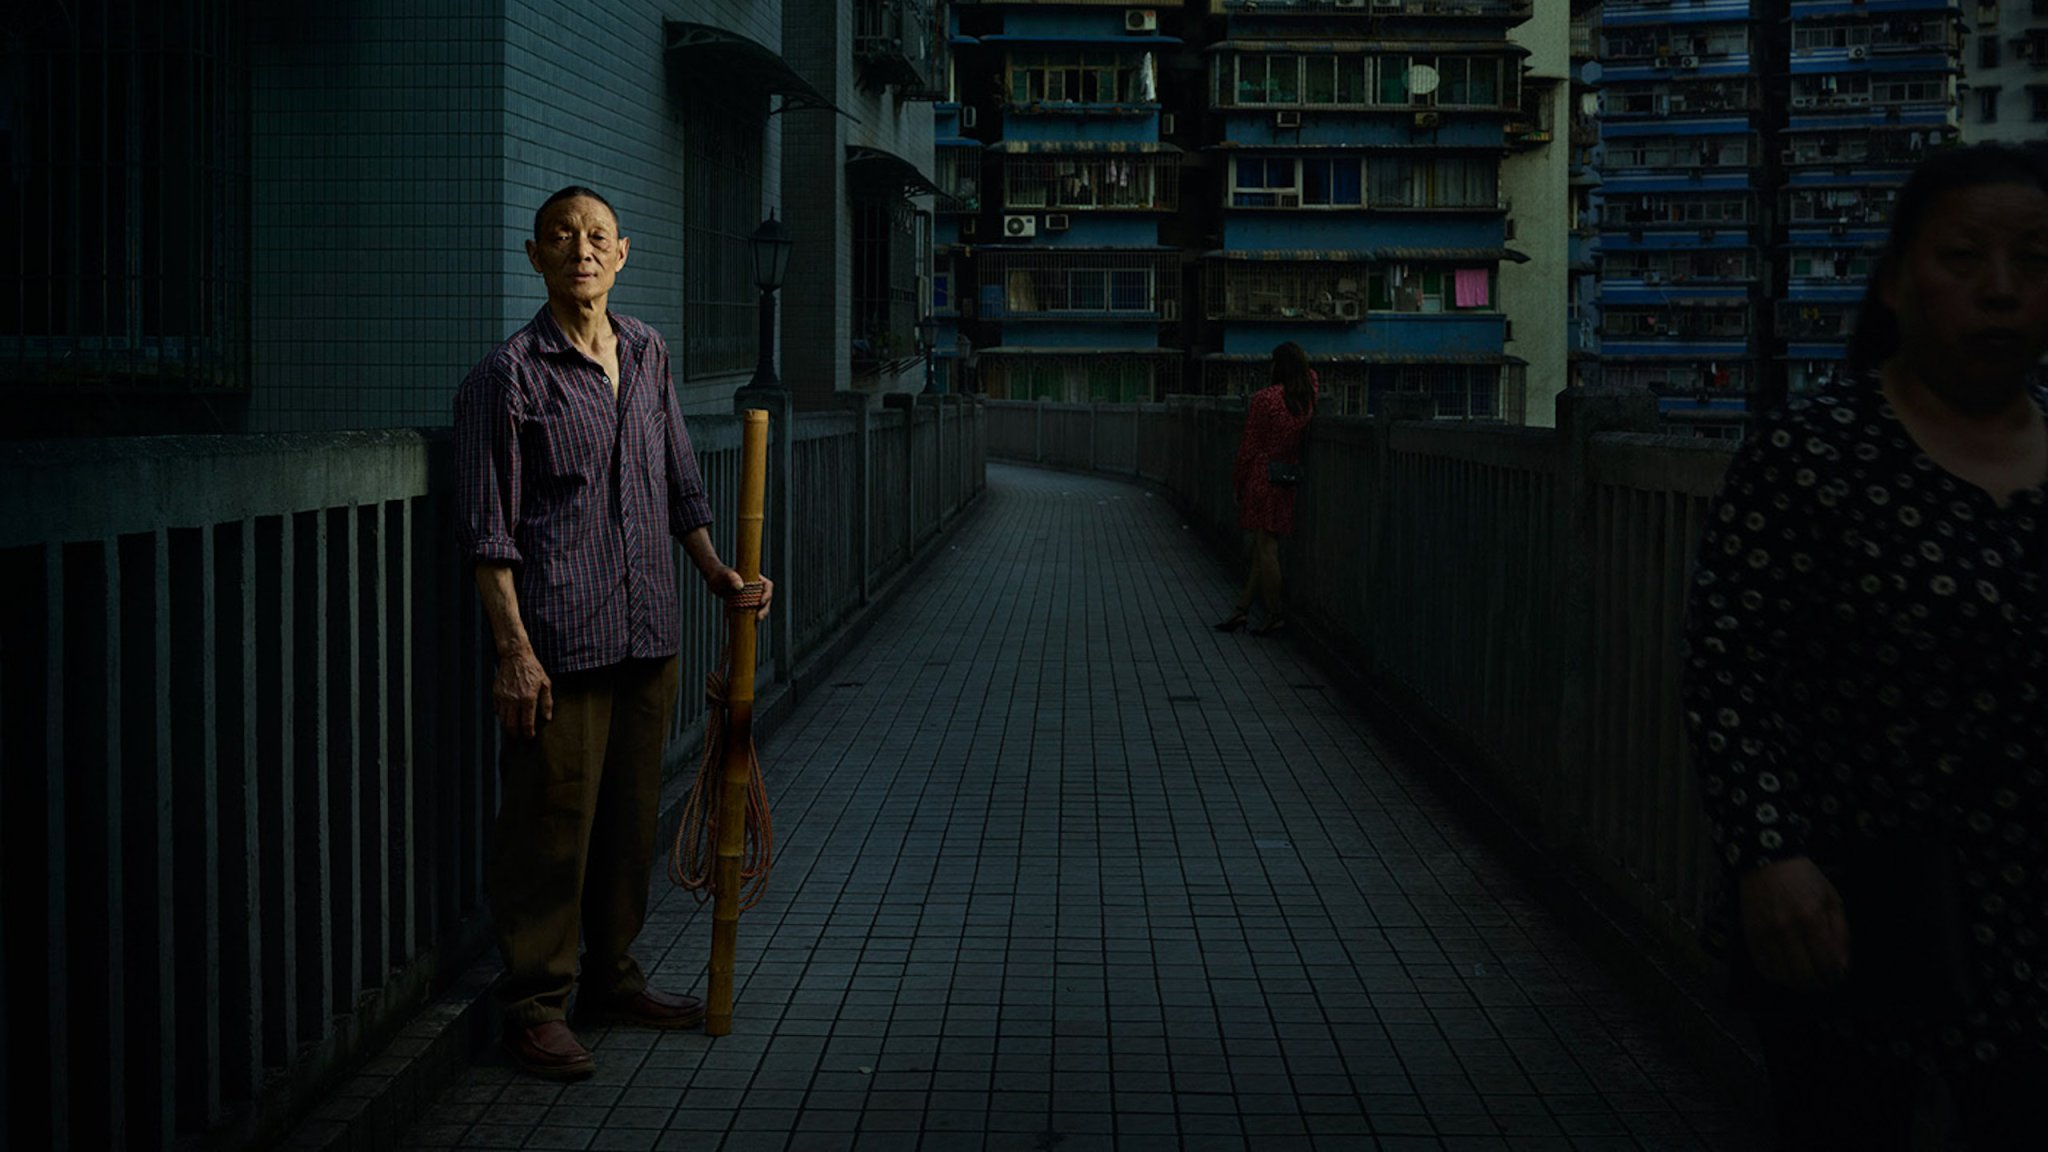 Documentary portraits star Chongqing's last Bang Bang Men